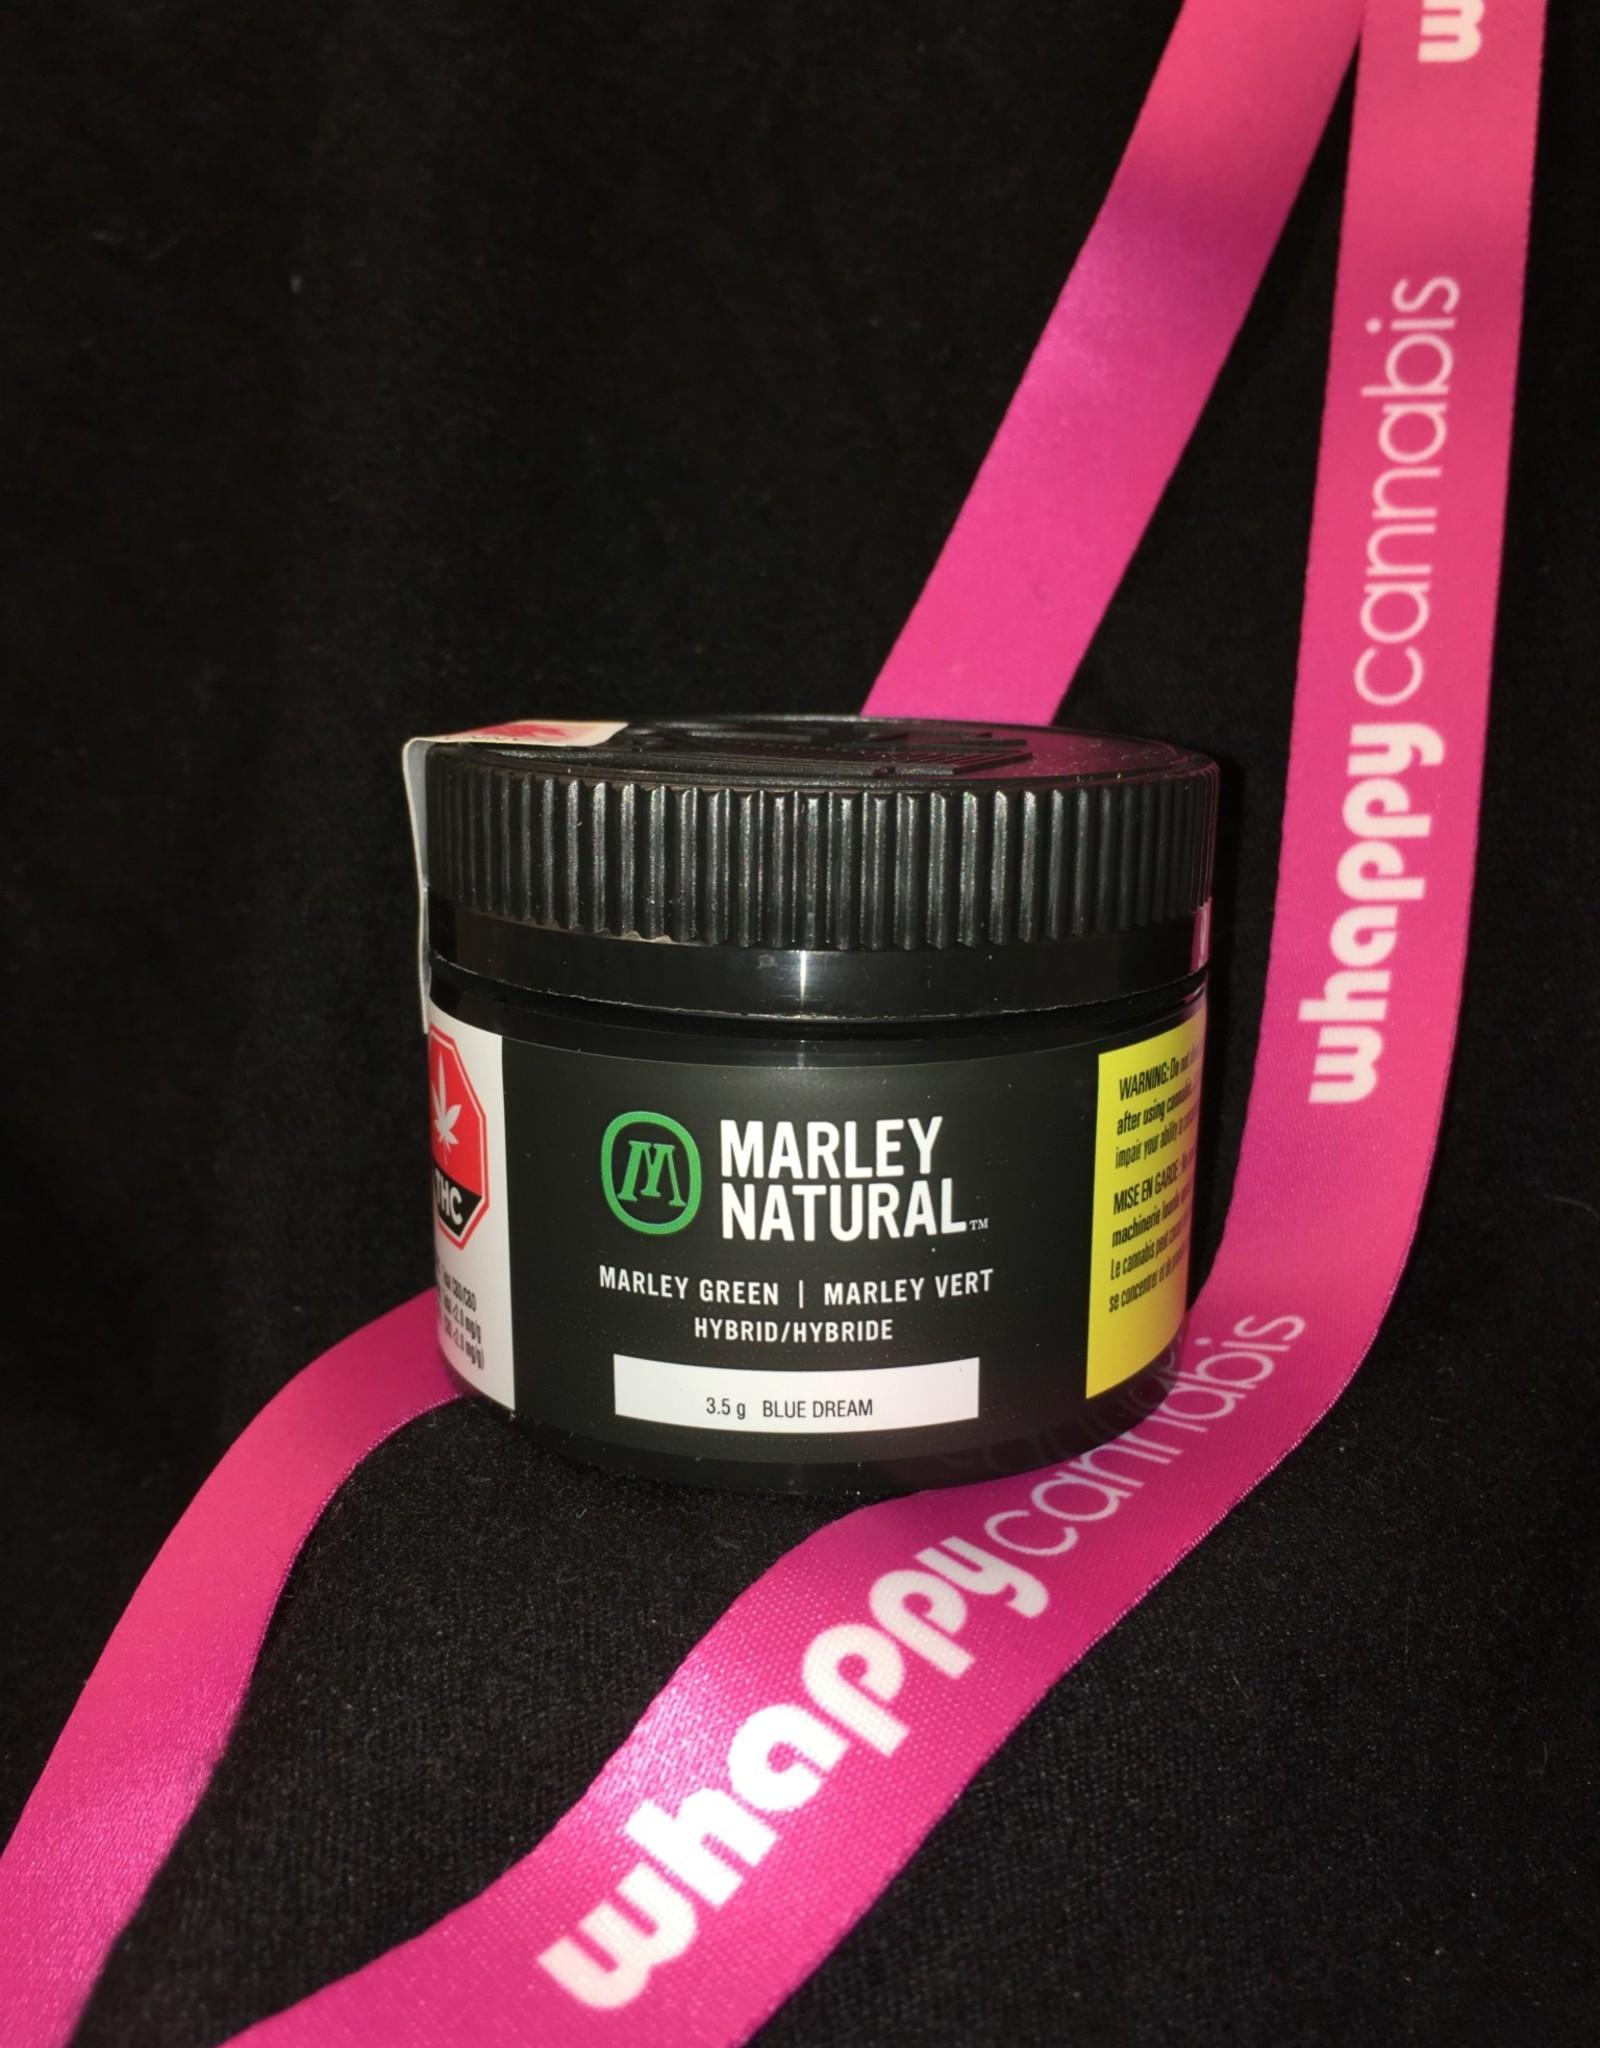 Marley Natural Marley Natural - Marley Green Sativa 3.5g